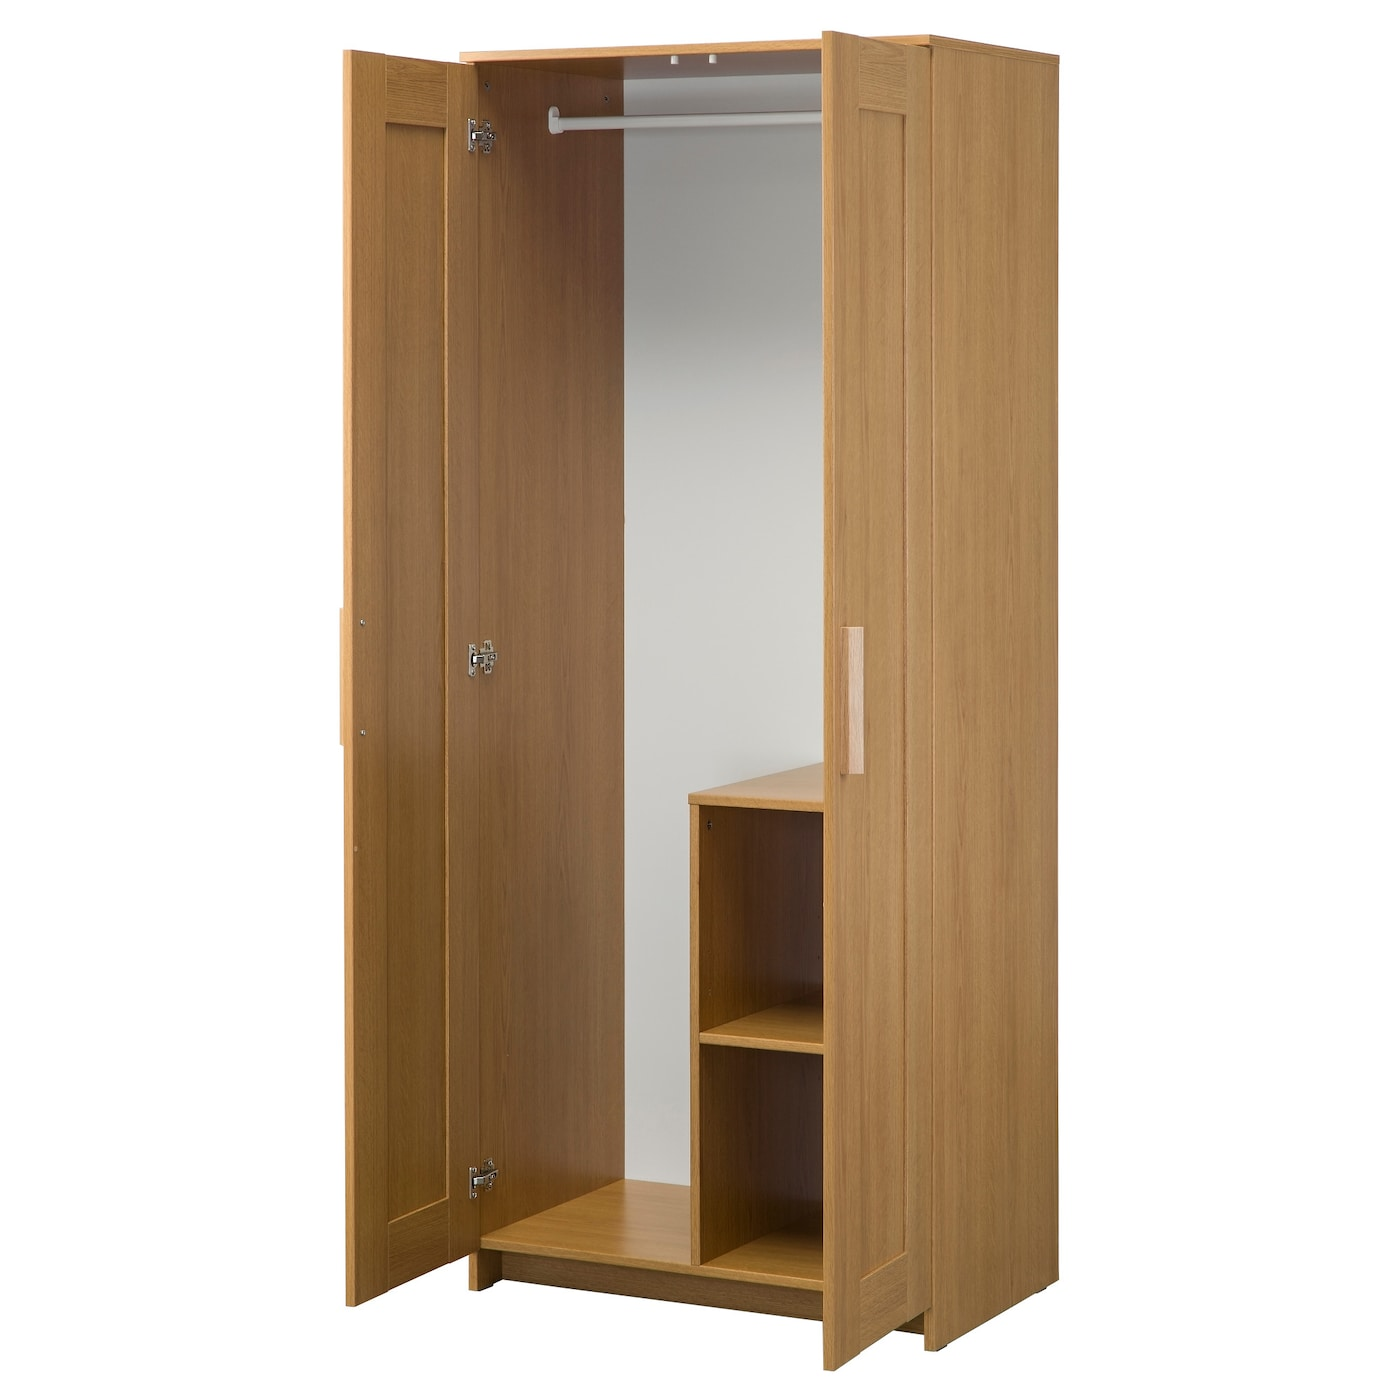 brimnes wardrobe with 2 doors oak effect 78 x 190 cm ikea. Black Bedroom Furniture Sets. Home Design Ideas